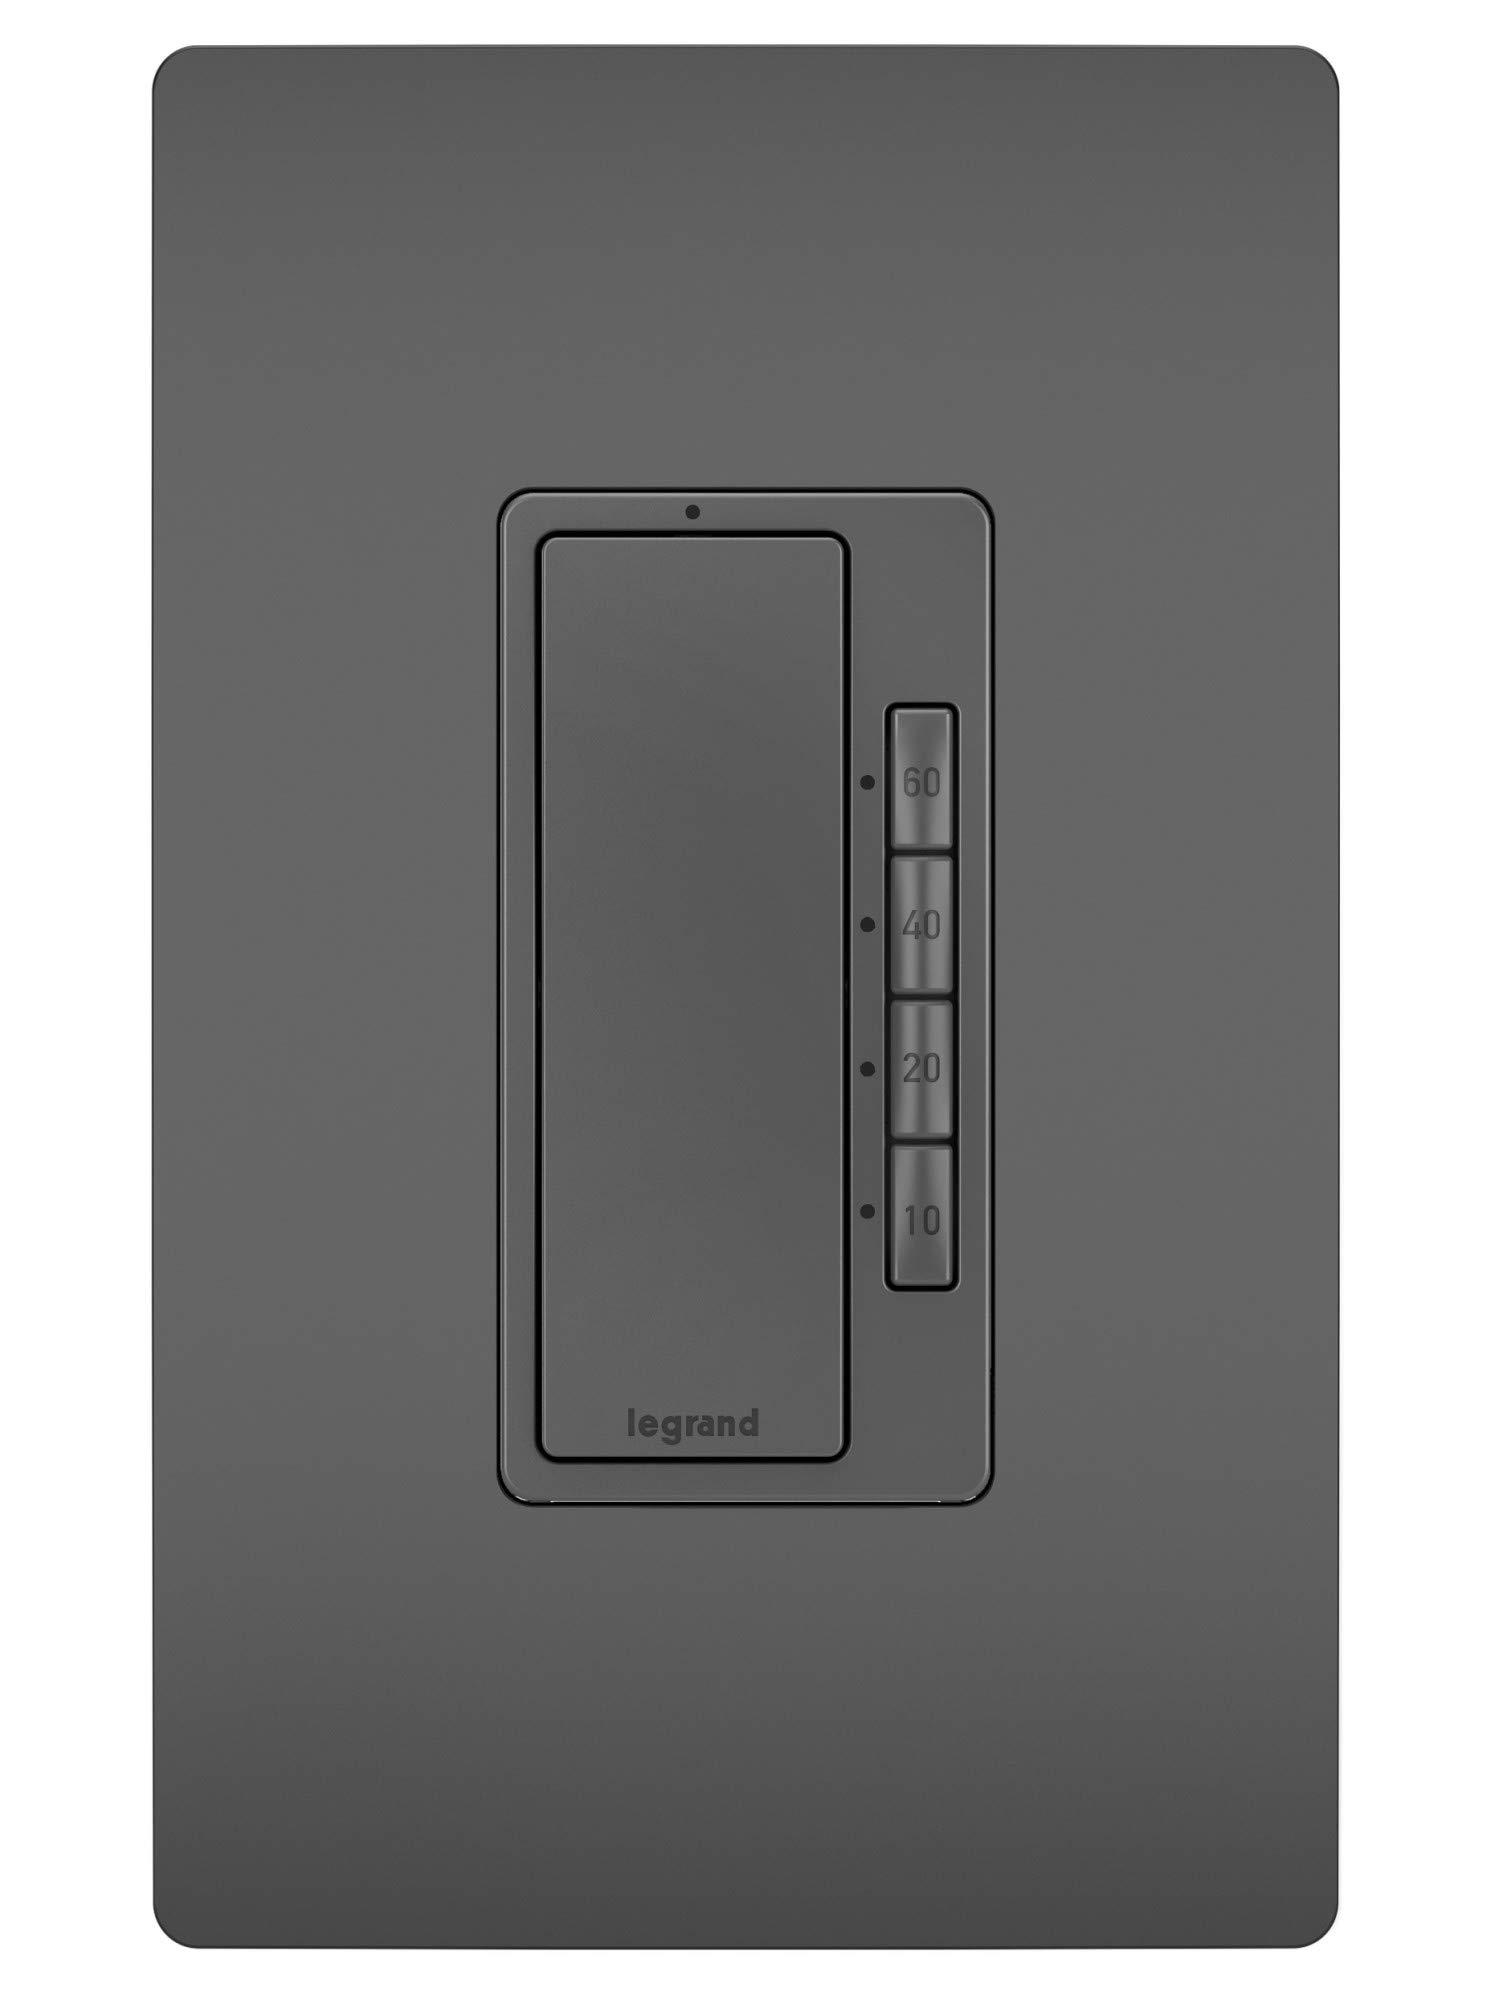 Legrand RT2BK Radiant 5 Button Digital Timer Multi Way Switch